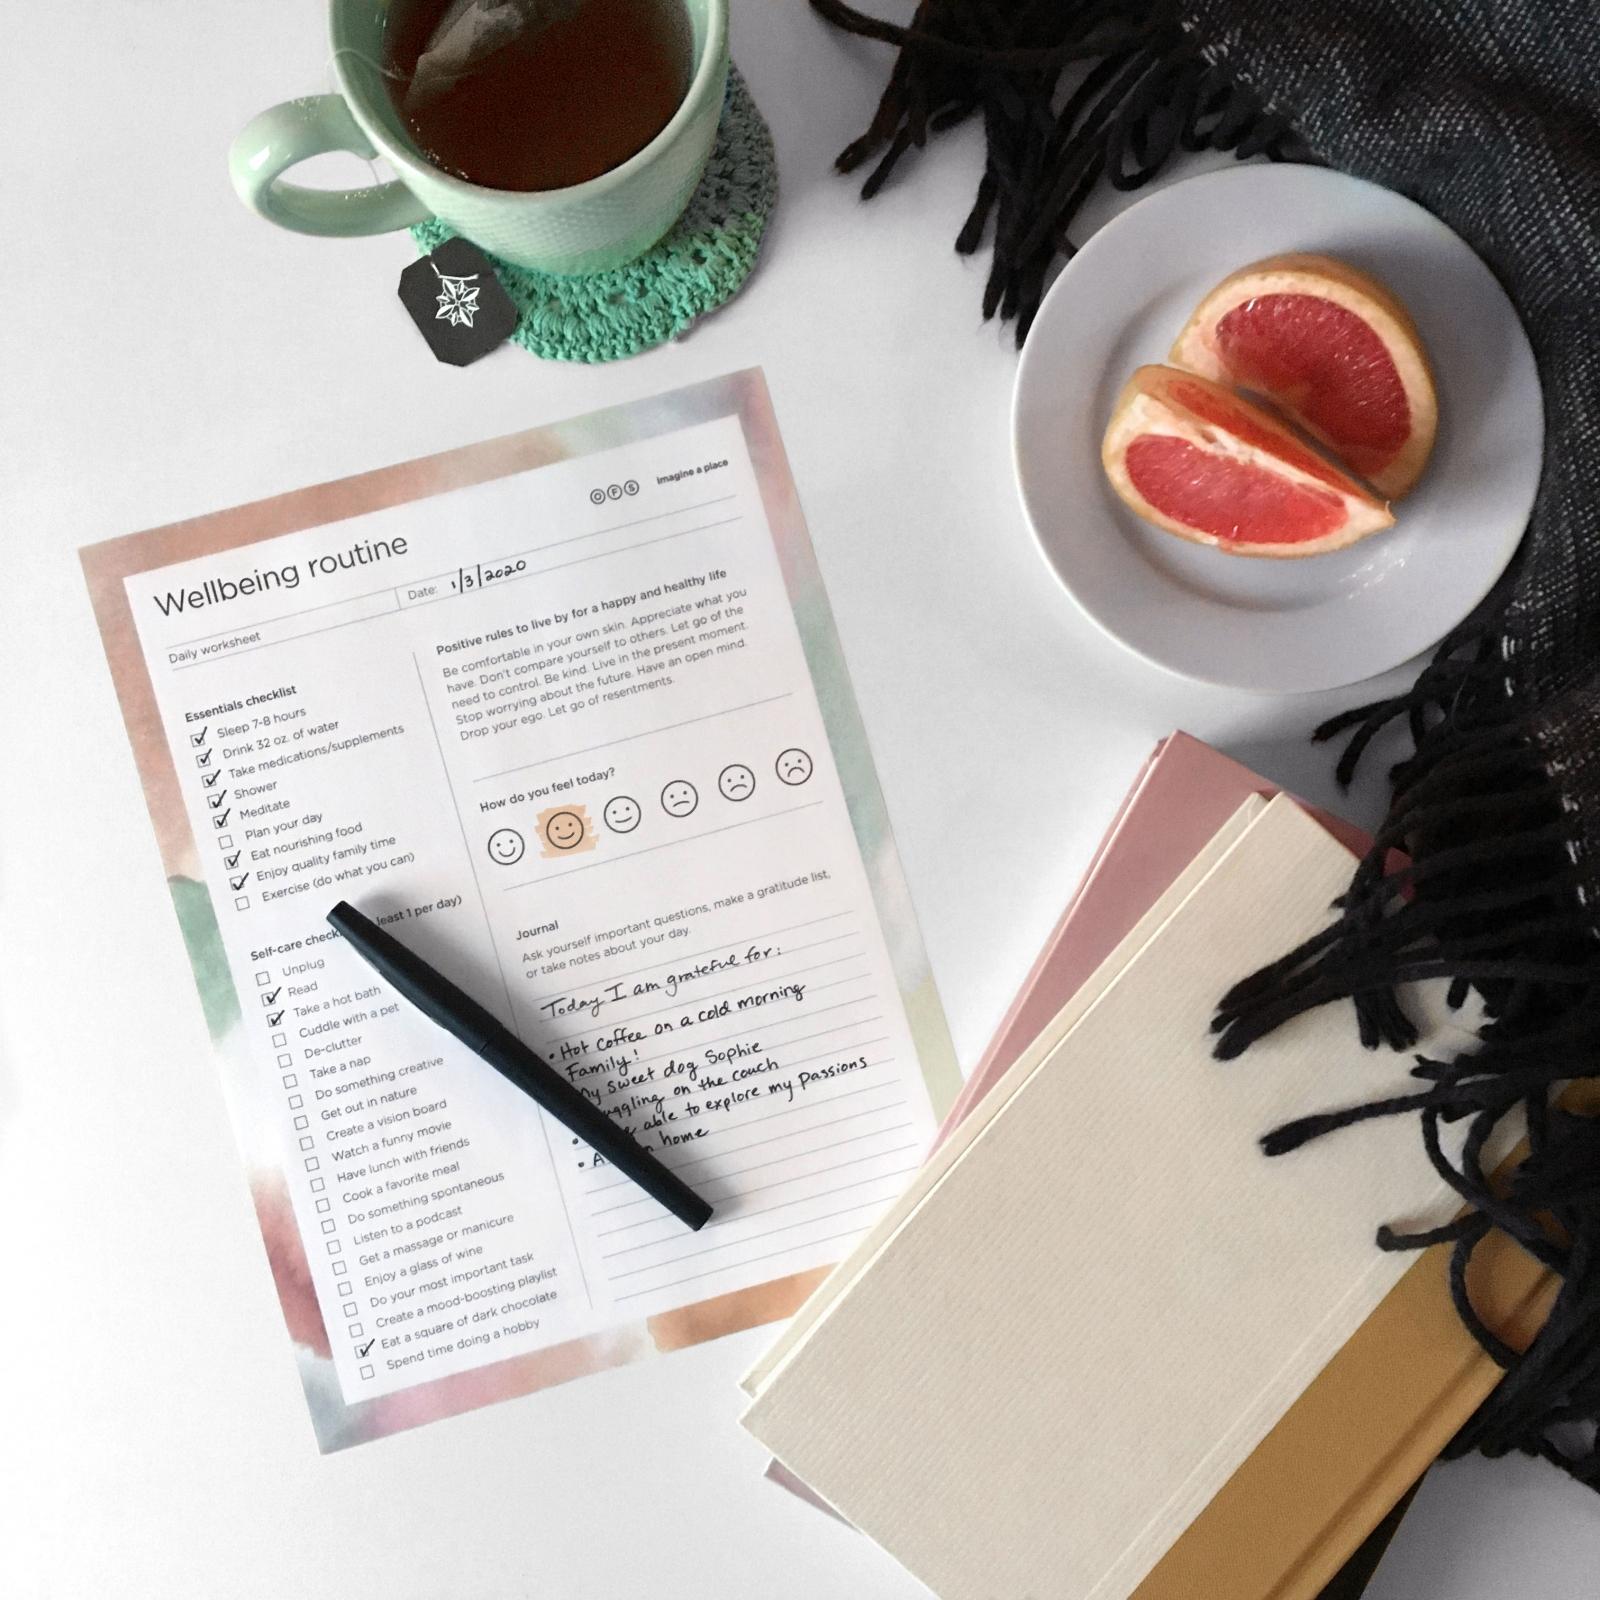 Wellbeing routine worksheet